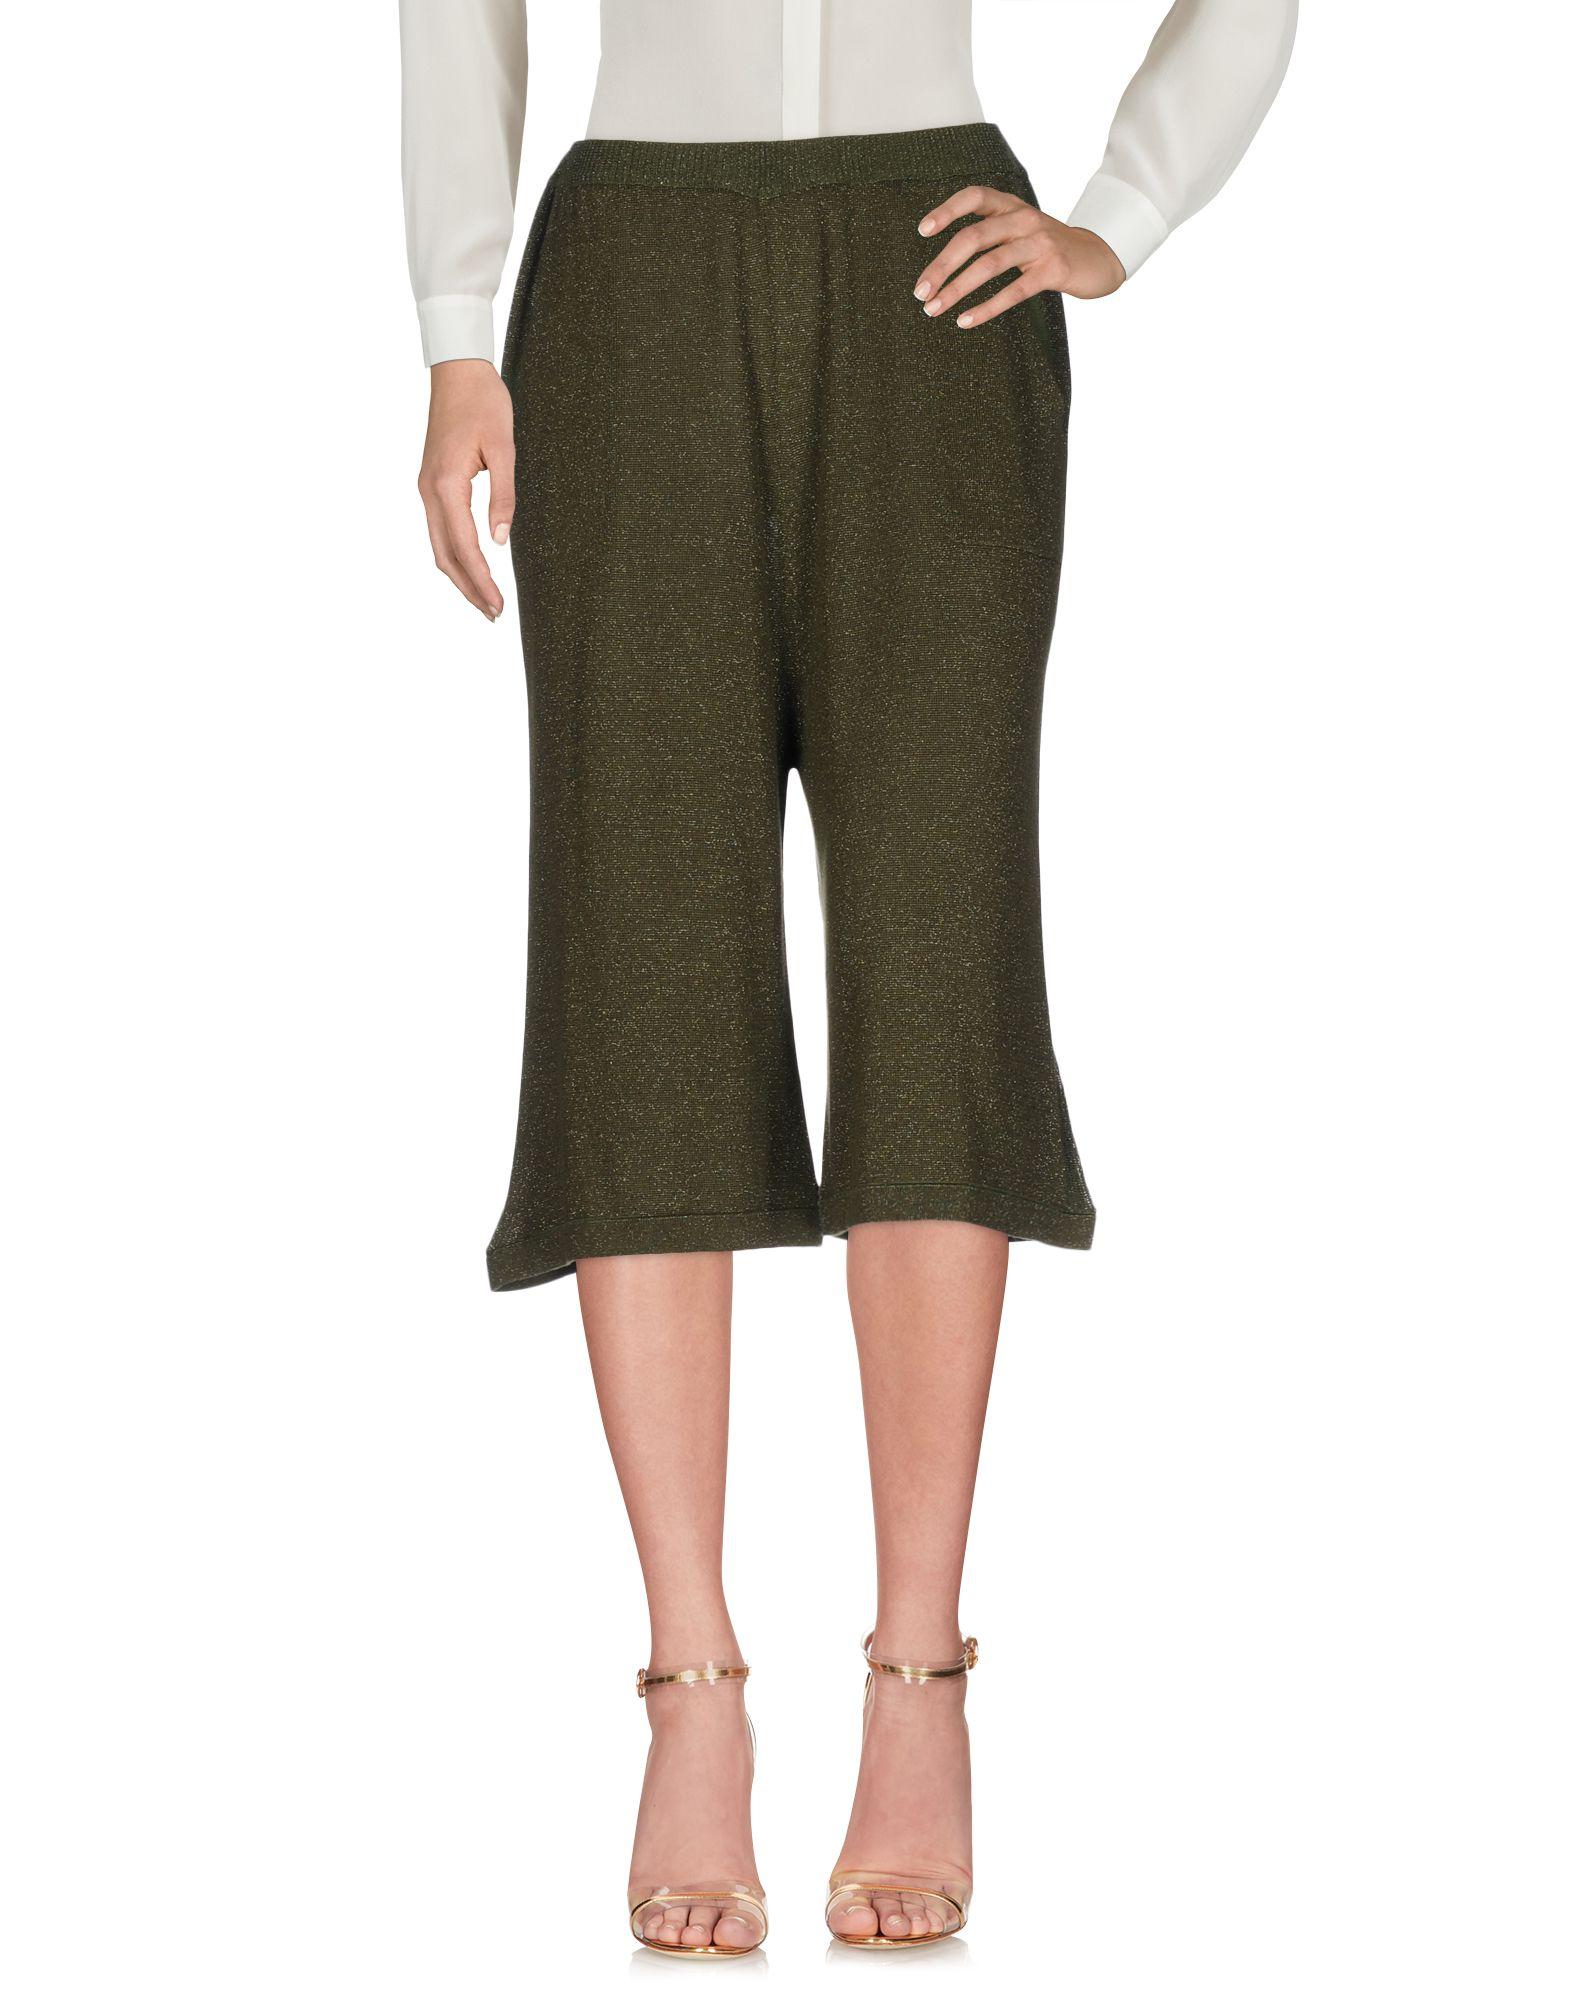 CHIARA BERTANI Брюки-капри три четверти брюки moda di chiara брюки широкие